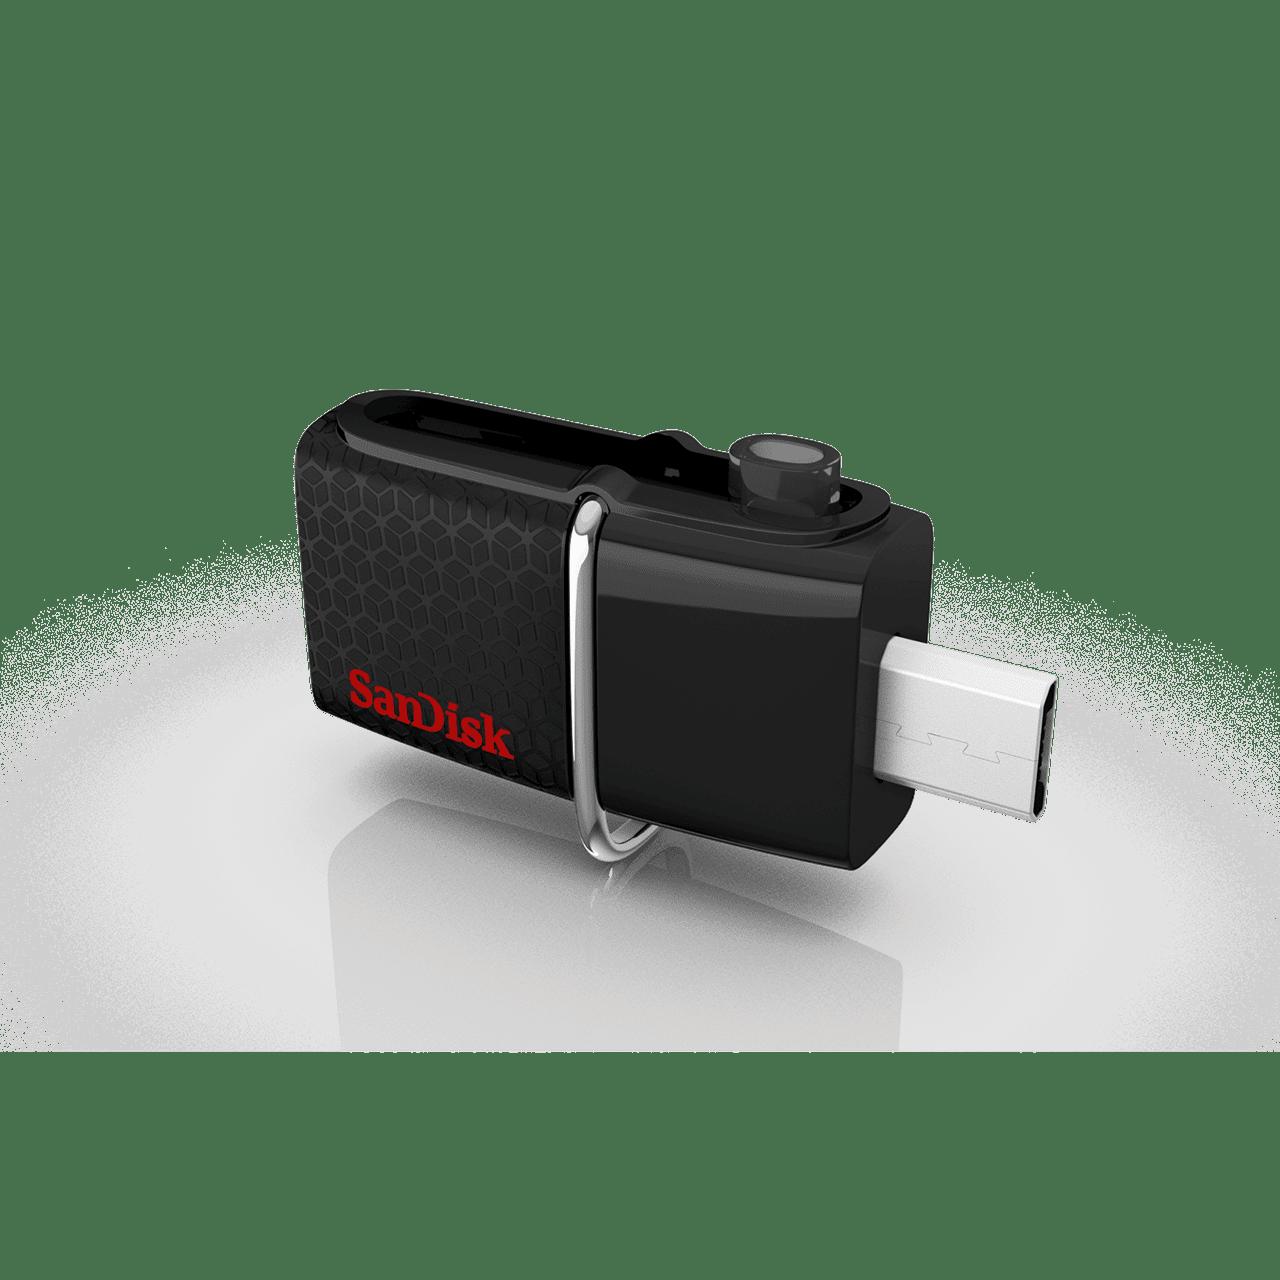 Sandisk Ultra Dual Drive Usb 3 0